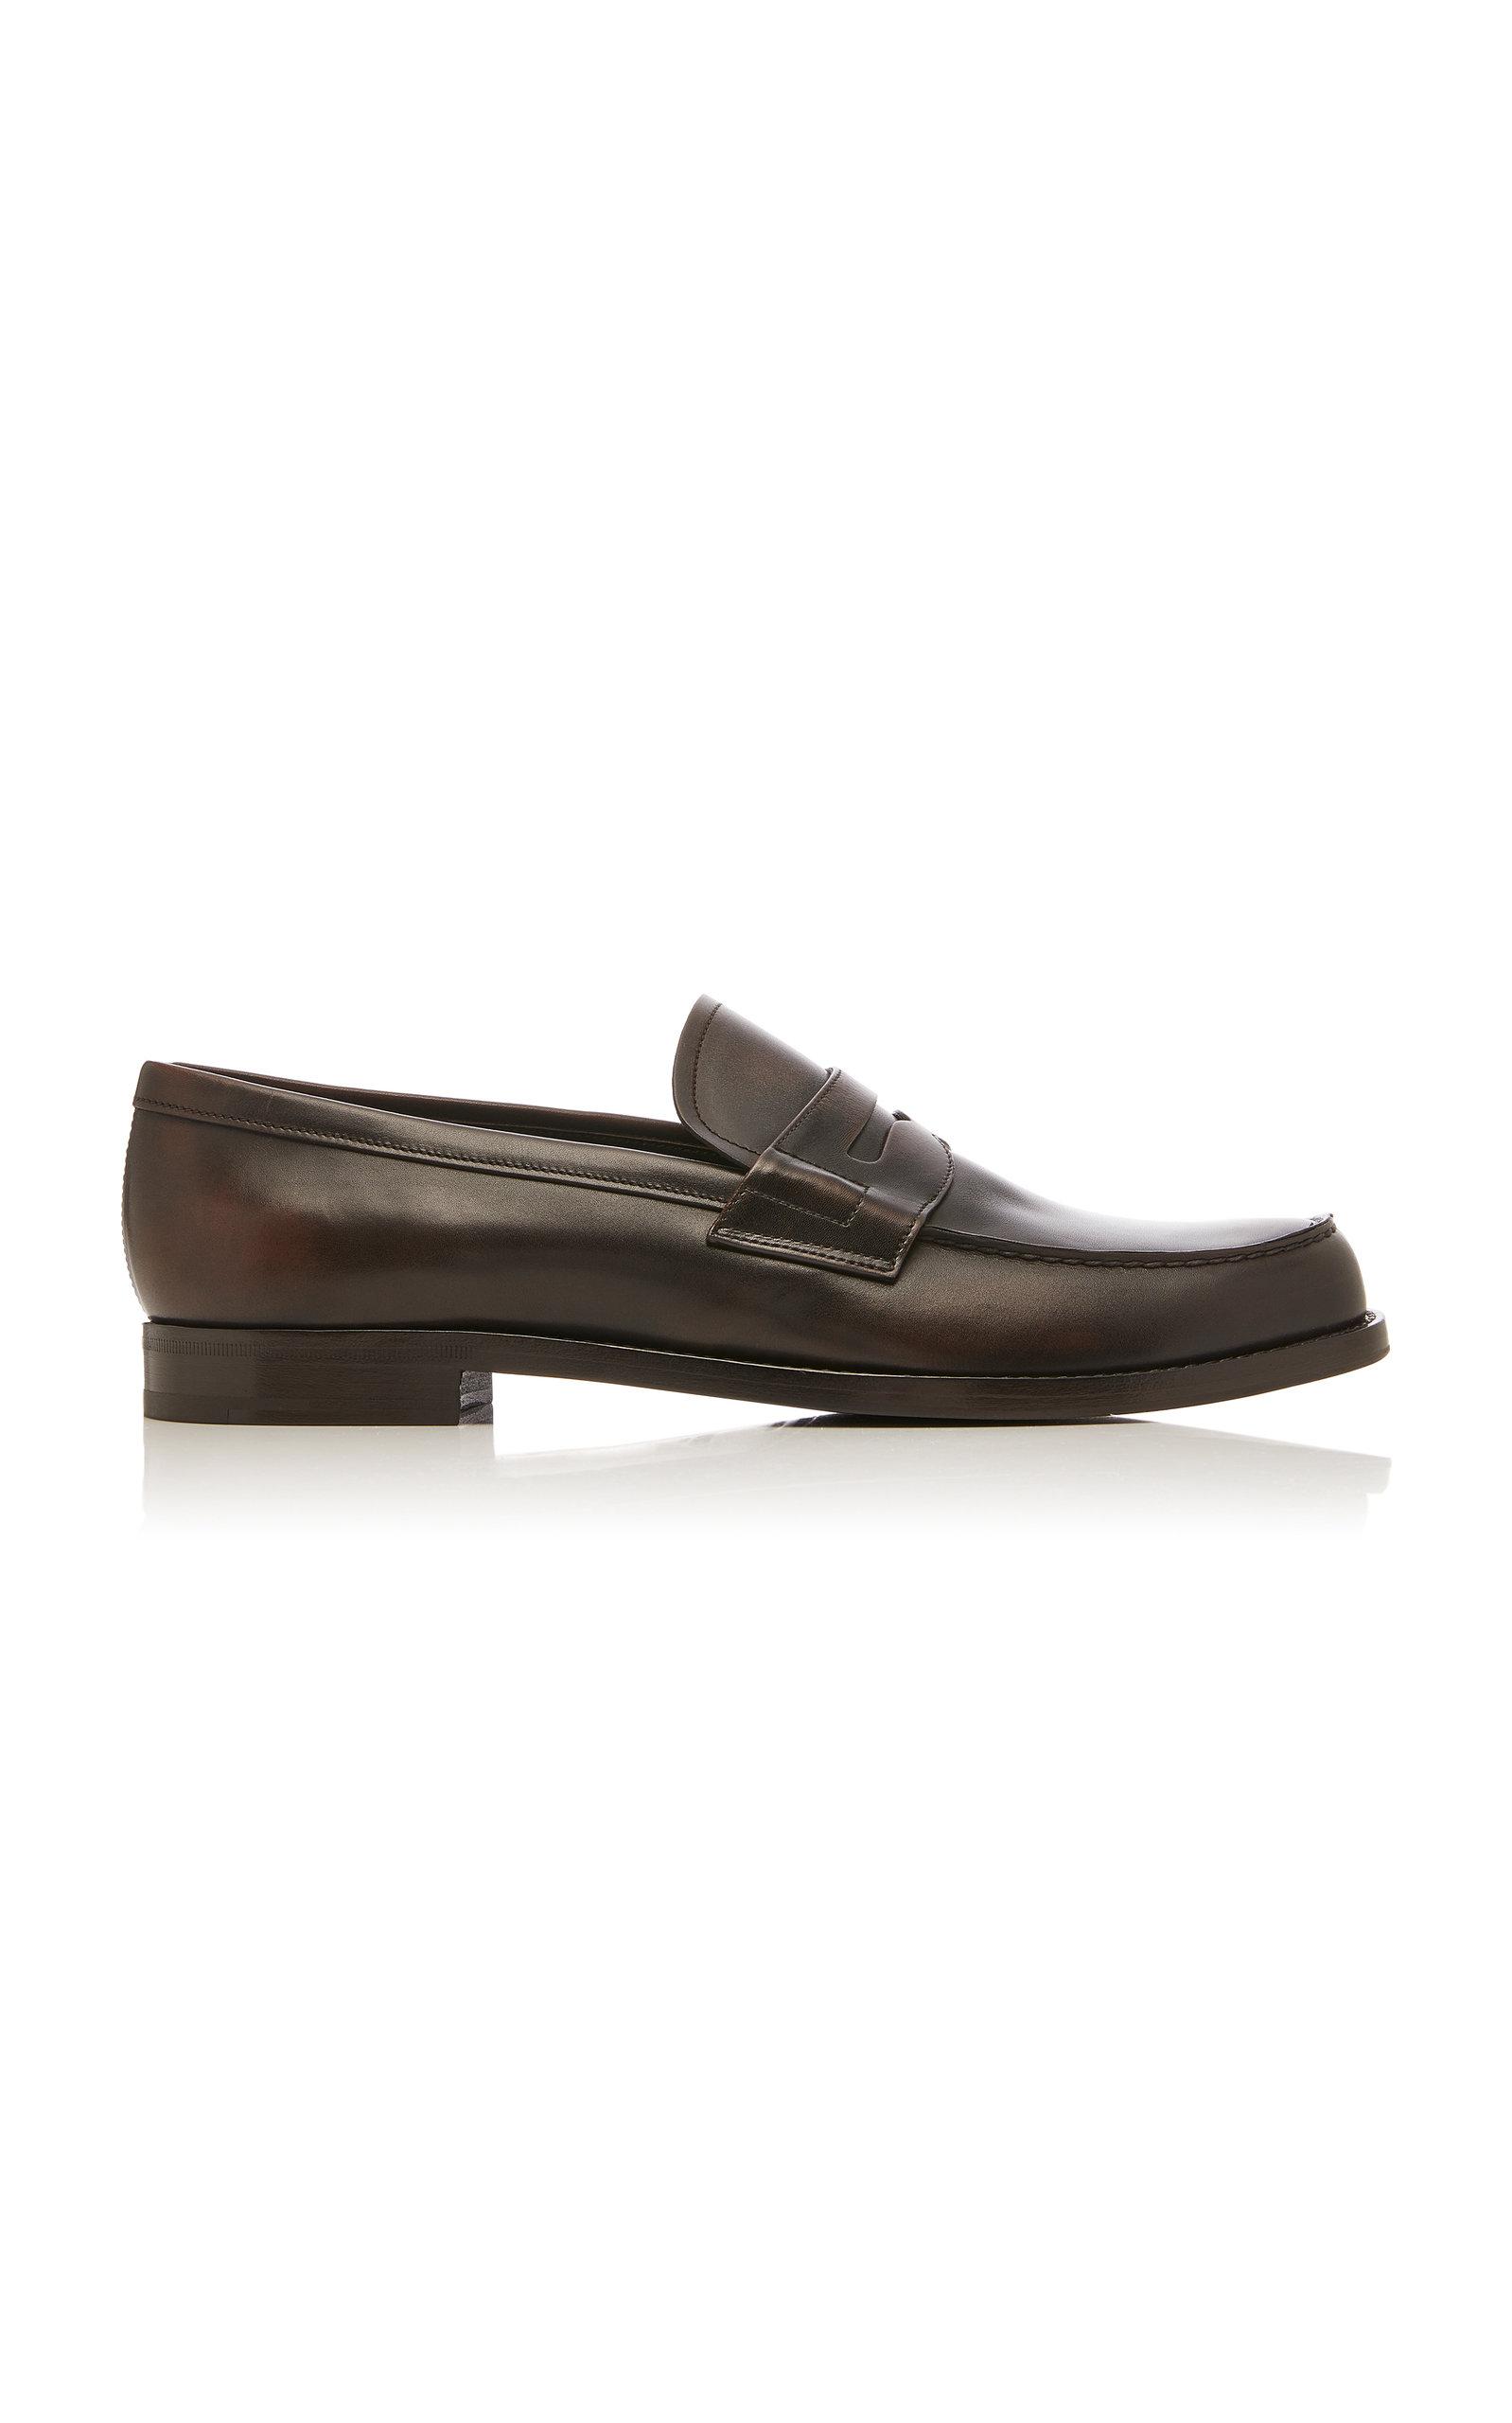 502b13b8756 PradaVitello Bristol Leather Penny Loafers. CLOSE. Loading